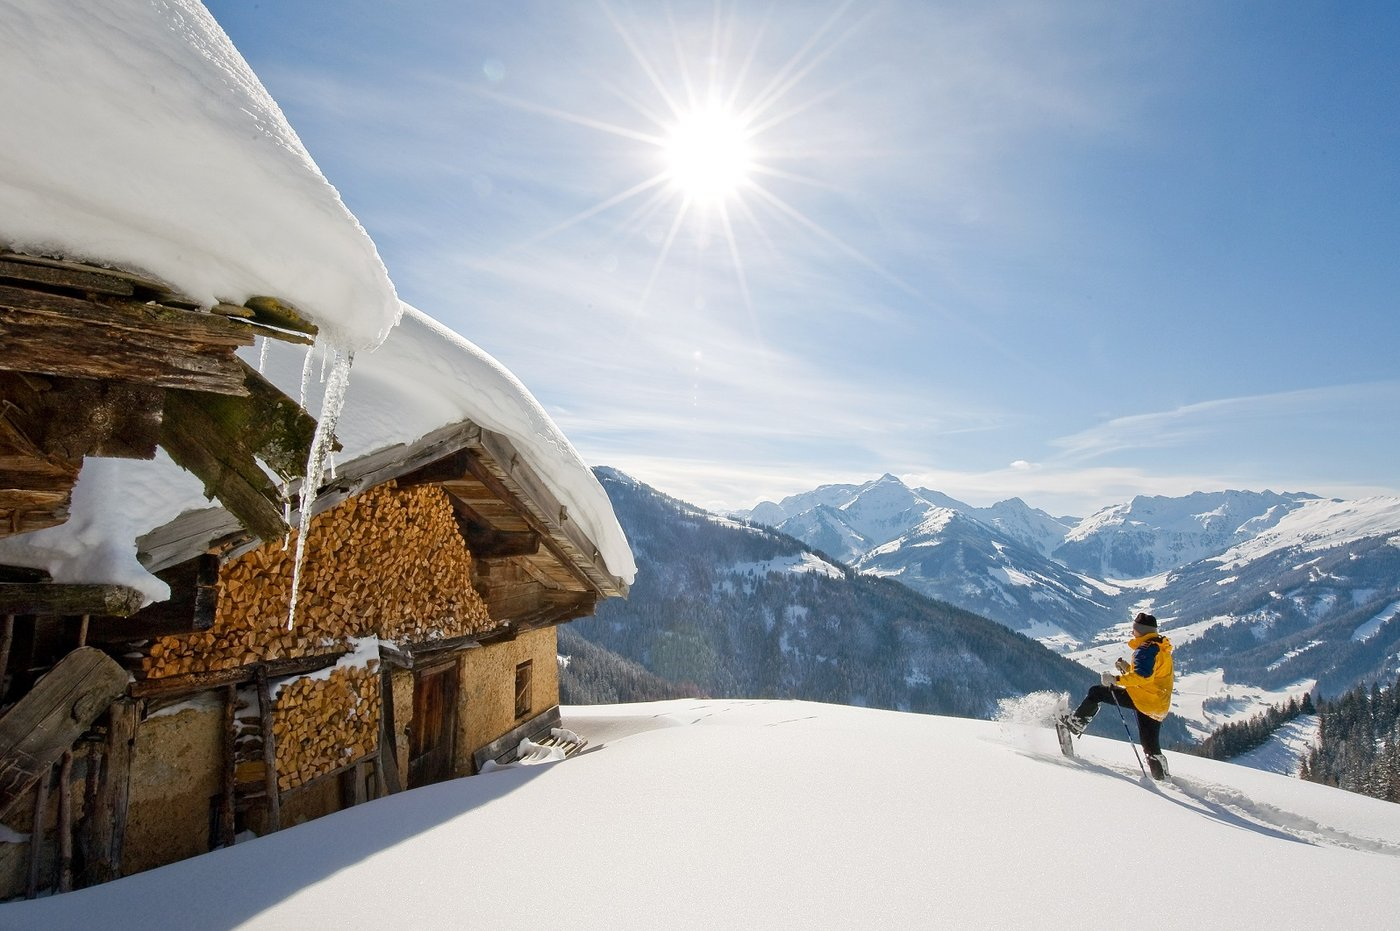 Schneeschuhwandern in Alpbach